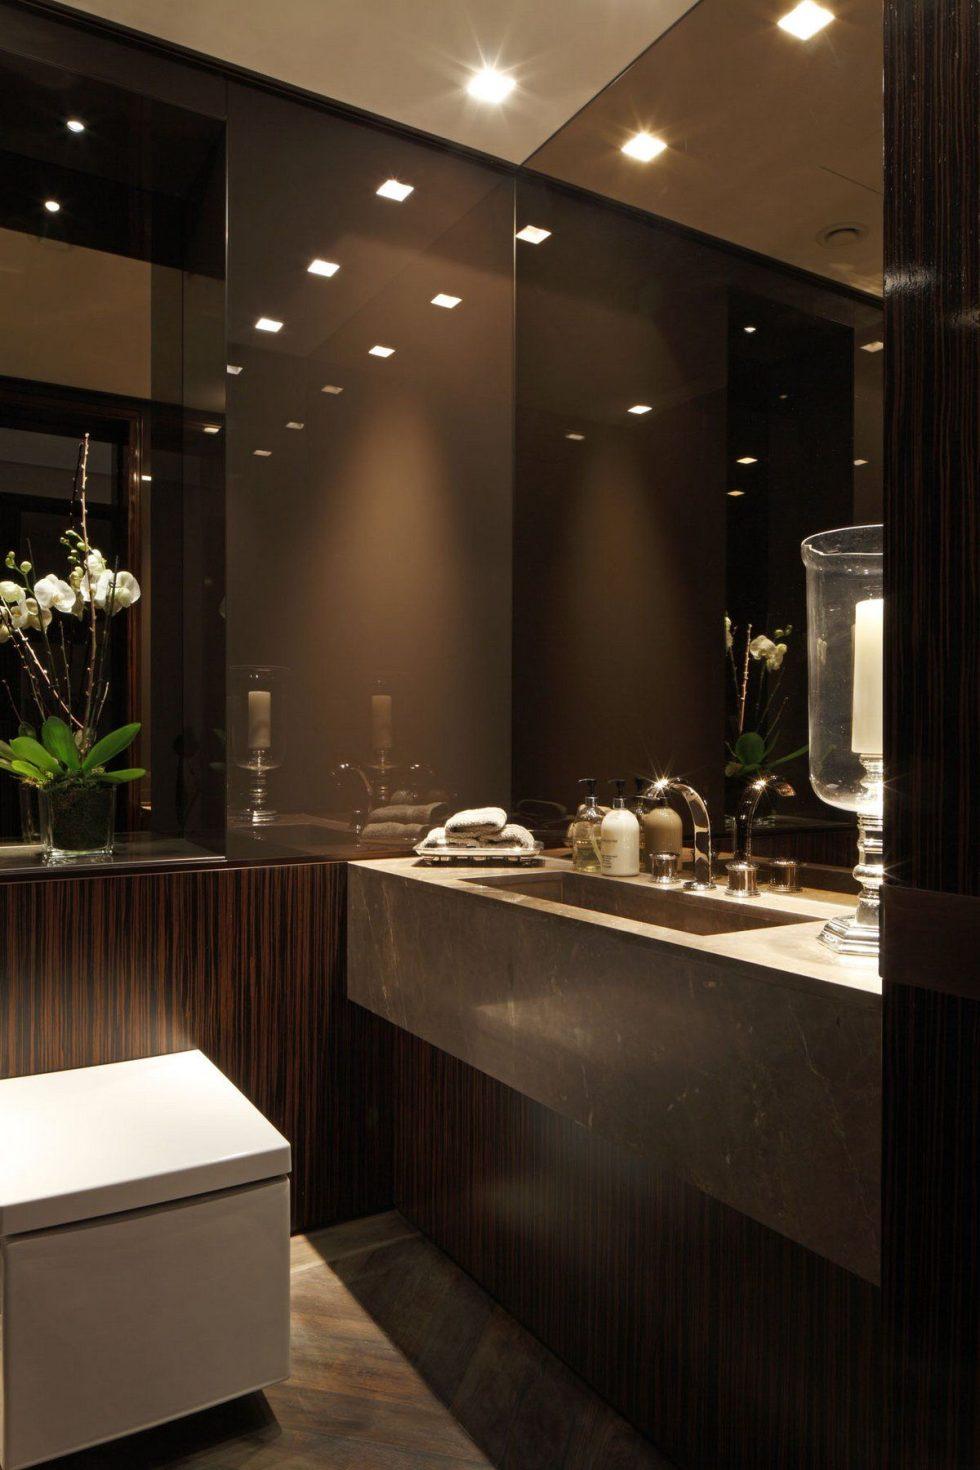 Kensington Place - Bathroom 2